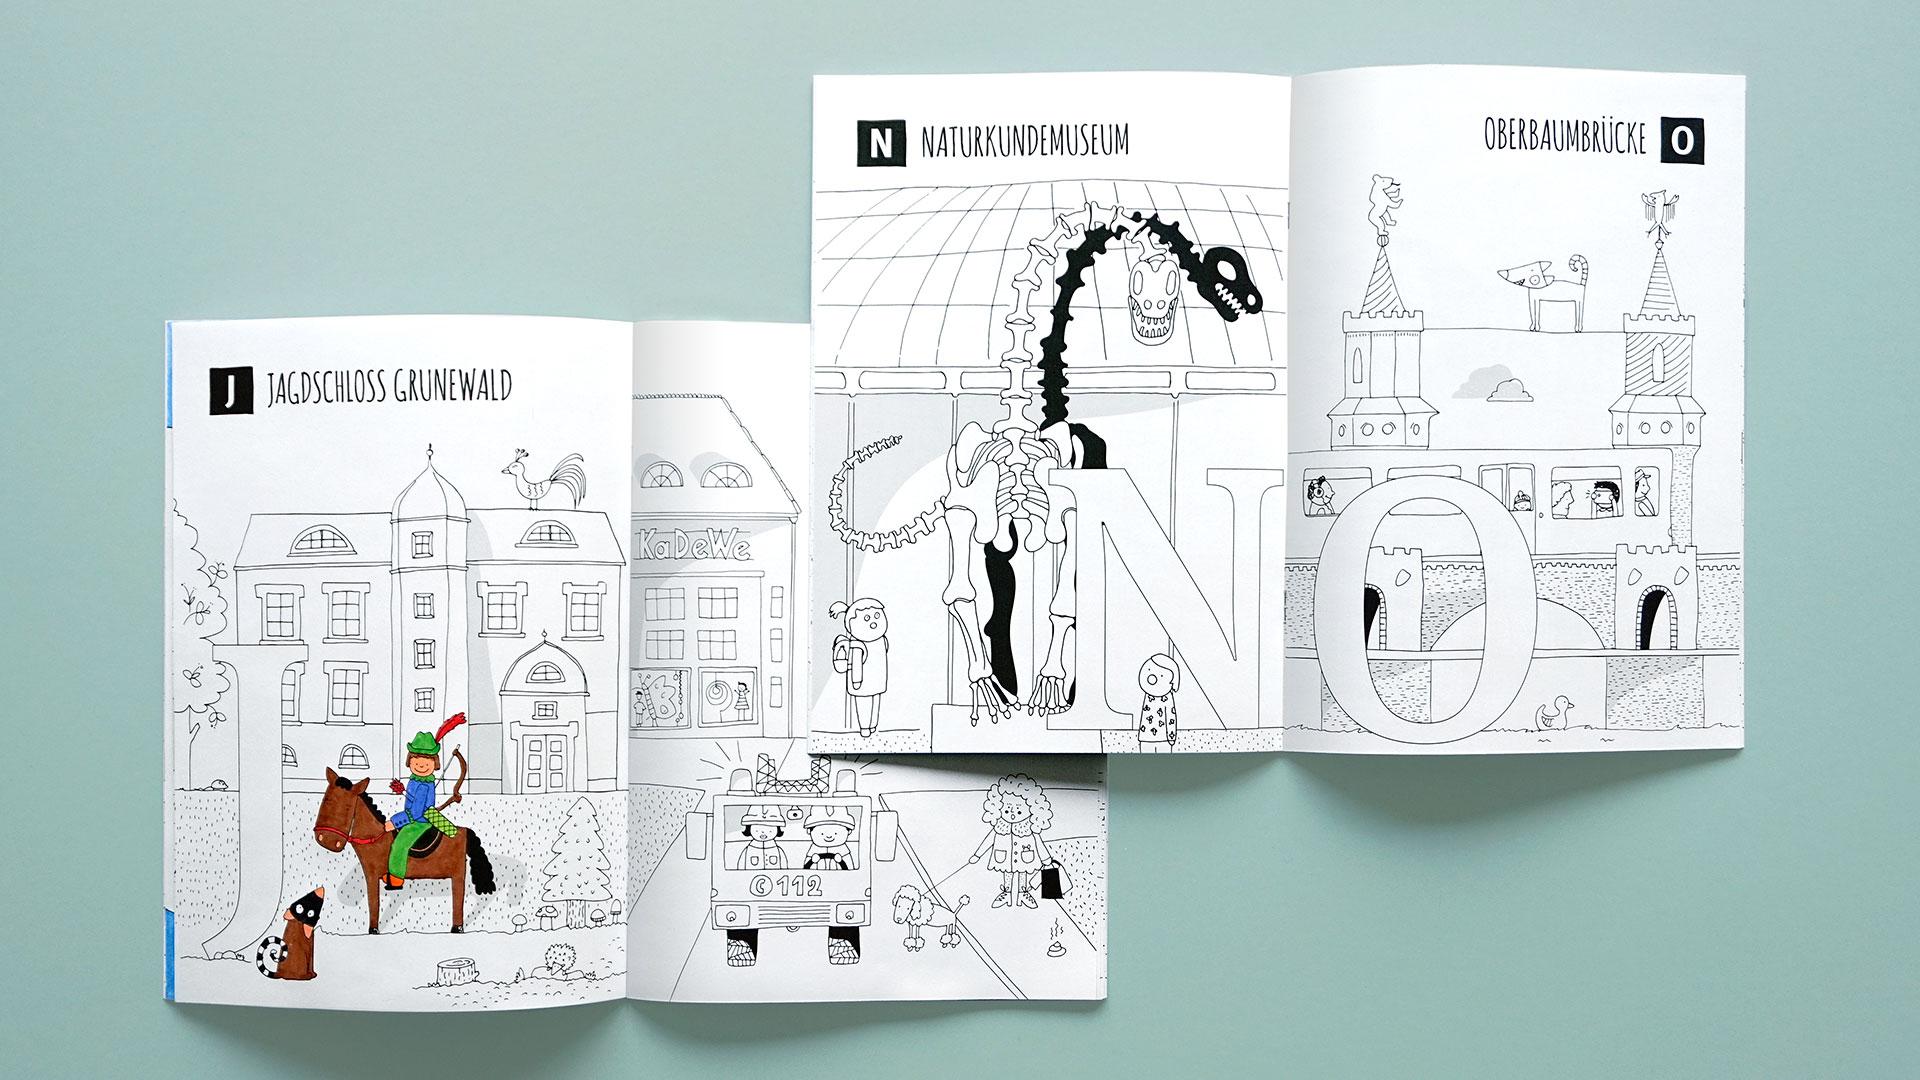 Berlin ABC Malbuch | Naturkundemuseum zum Ausmalen